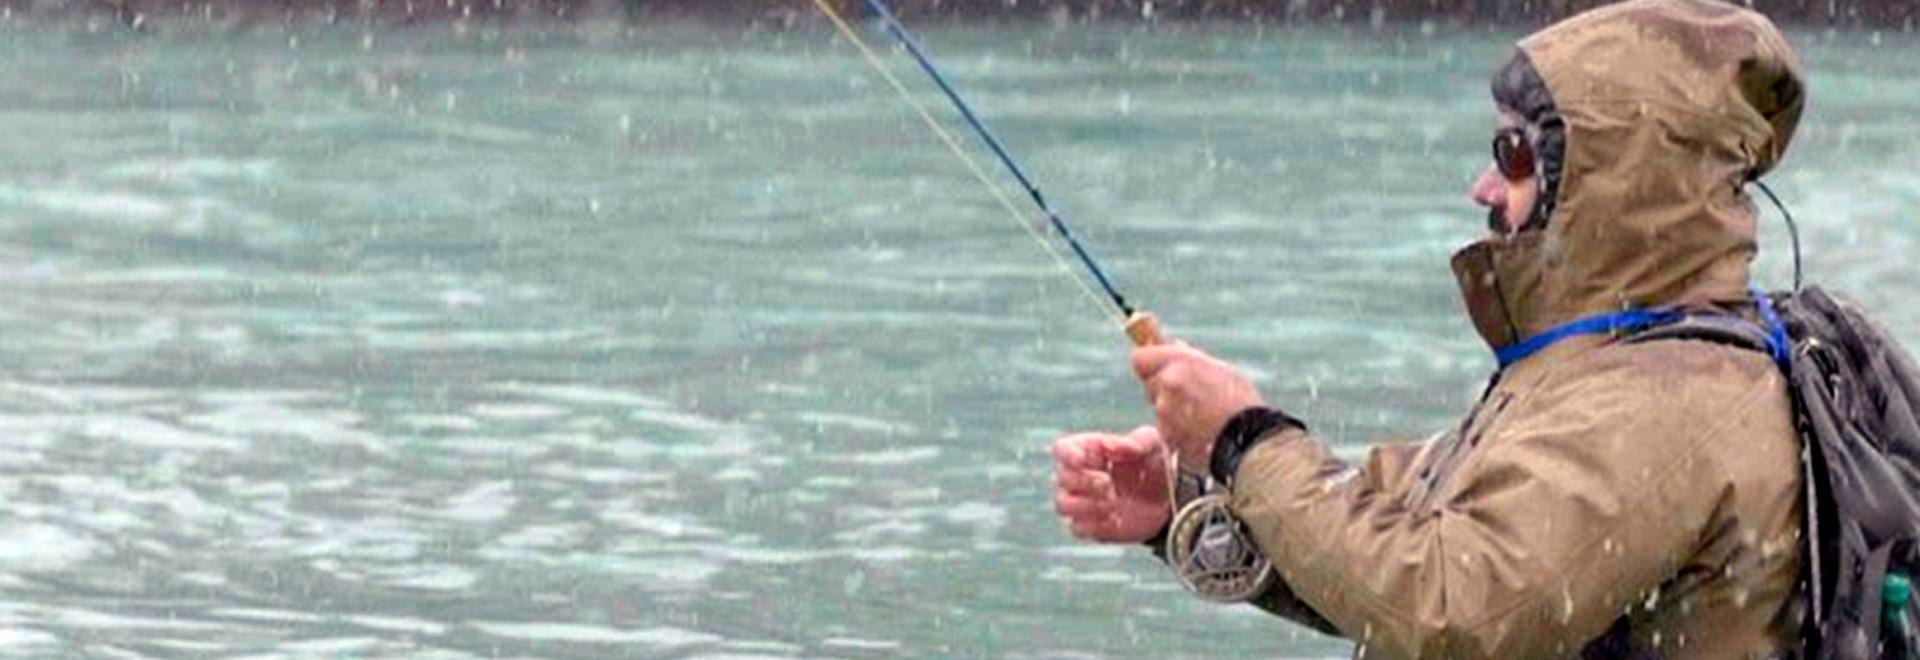 Pesca e tecnologia